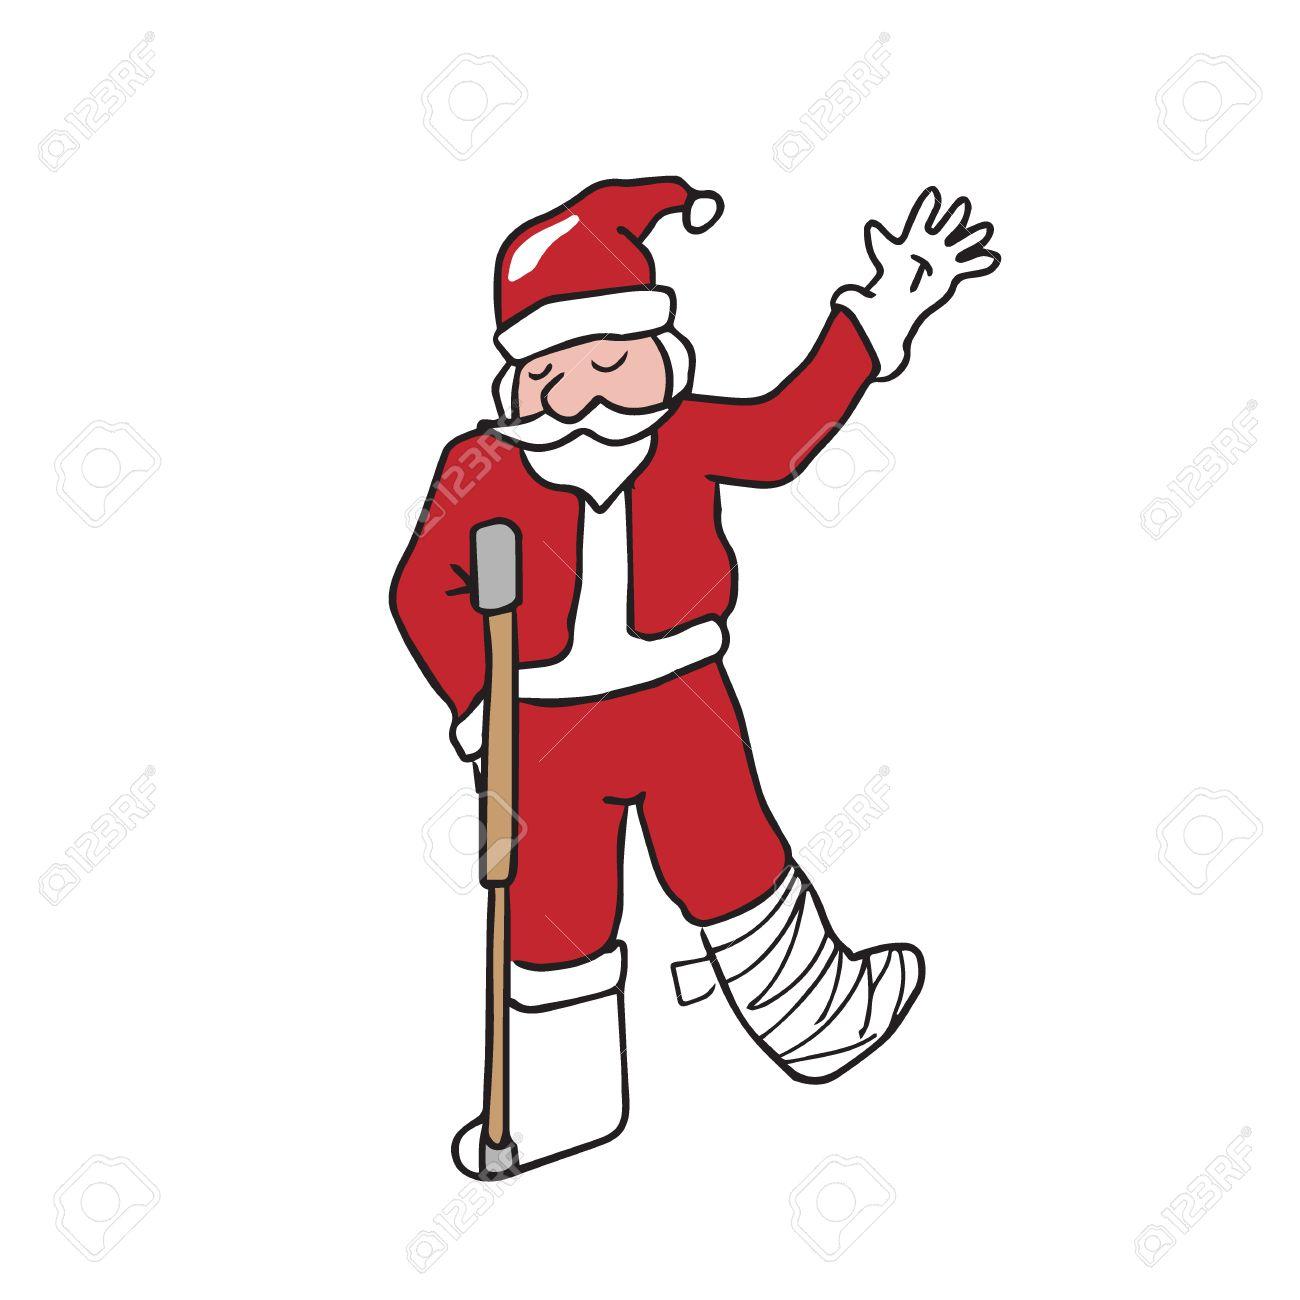 Santa legs clipart jpg transparent stock Santa with broken leg cartoon drawing » Clipart Station jpg transparent stock